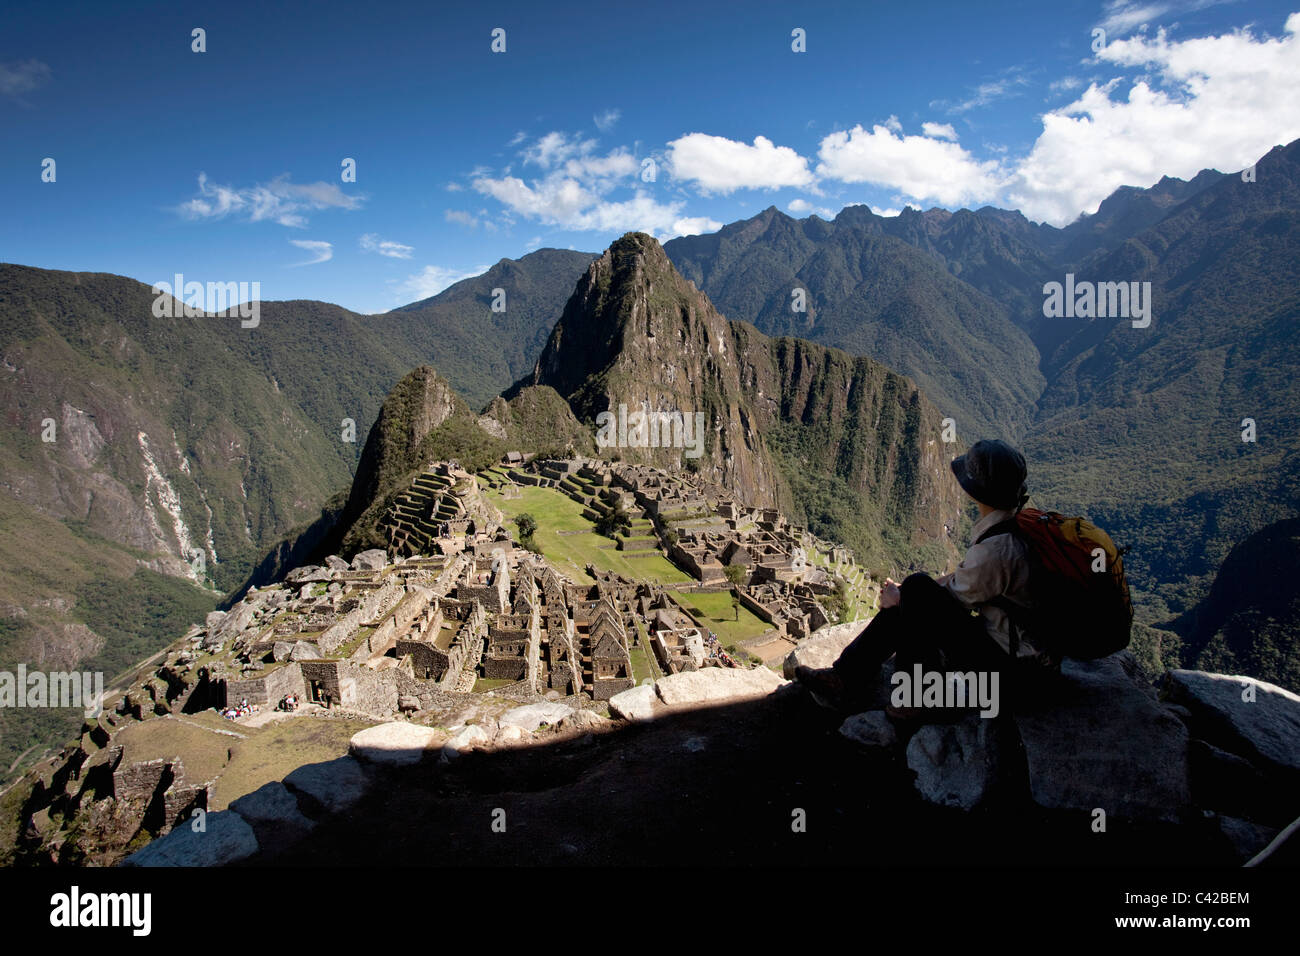 Peru, 15th-century Inca site located 2,430 metres (7,970 ft) above sea level. Tourist. - Stock Image